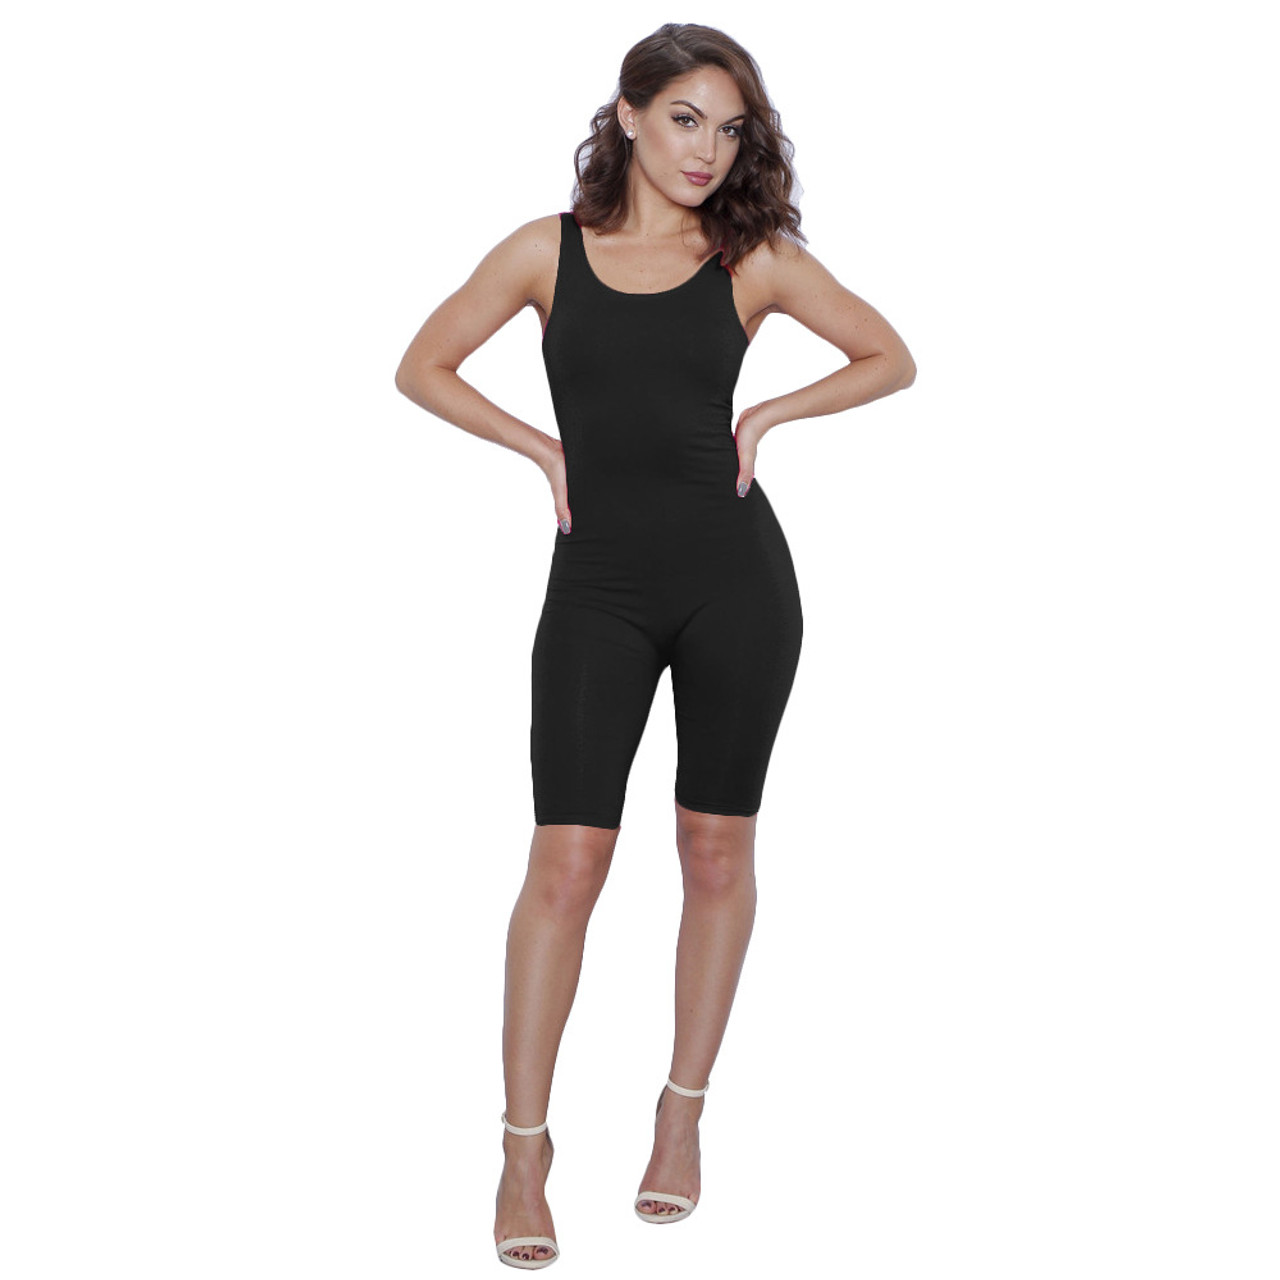 Sexy O-neck Sleeveless Bodysuit Women Jumpsuit Romper Body Zipper Top Bodysuit Overall Summer Solid Apparel Female Bodysuits